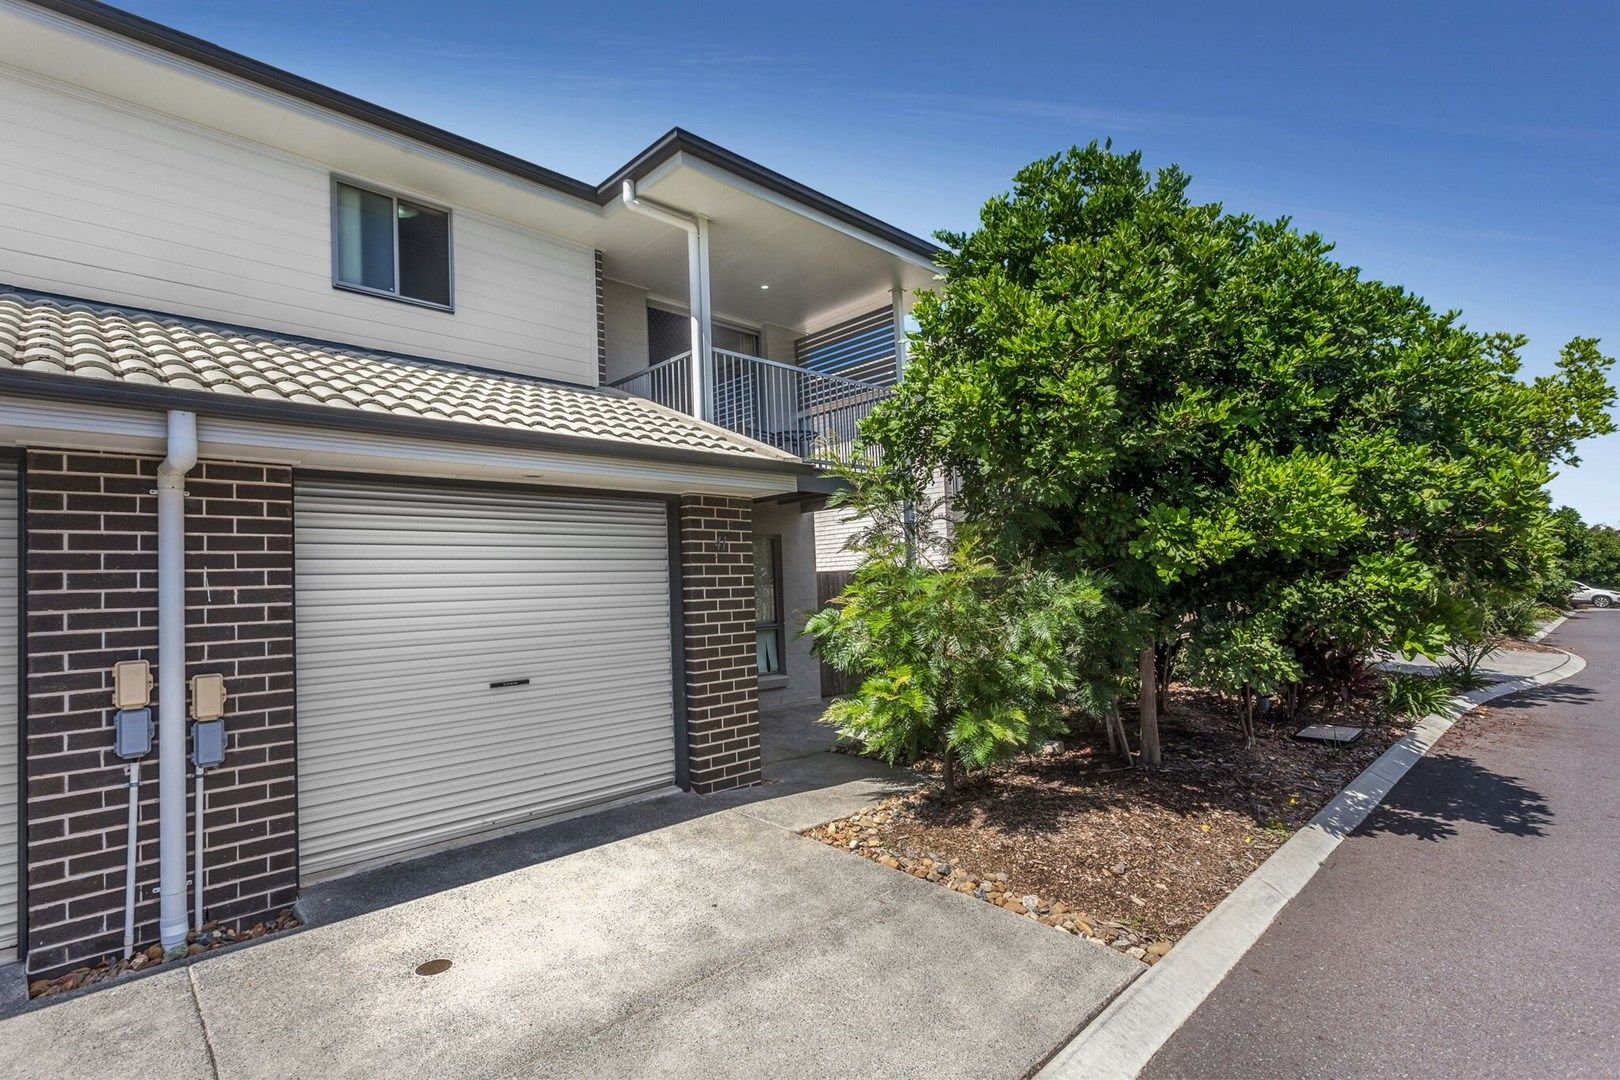 41/1 Gumview Street, Albany Creek QLD 4035, Image 0